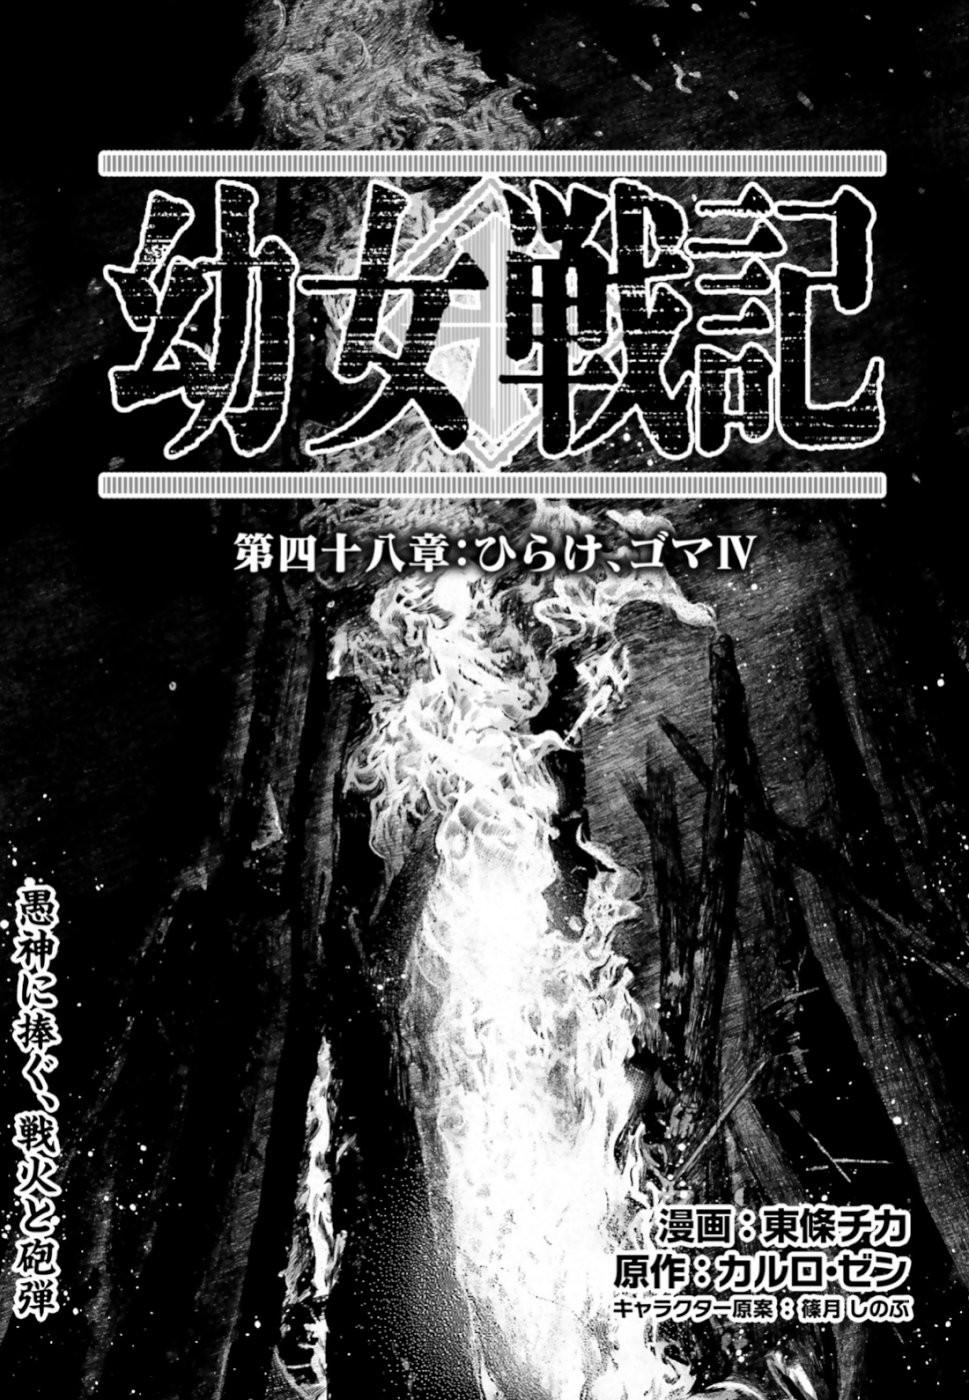 Youjo Senki - Chapter 48 - Page 1